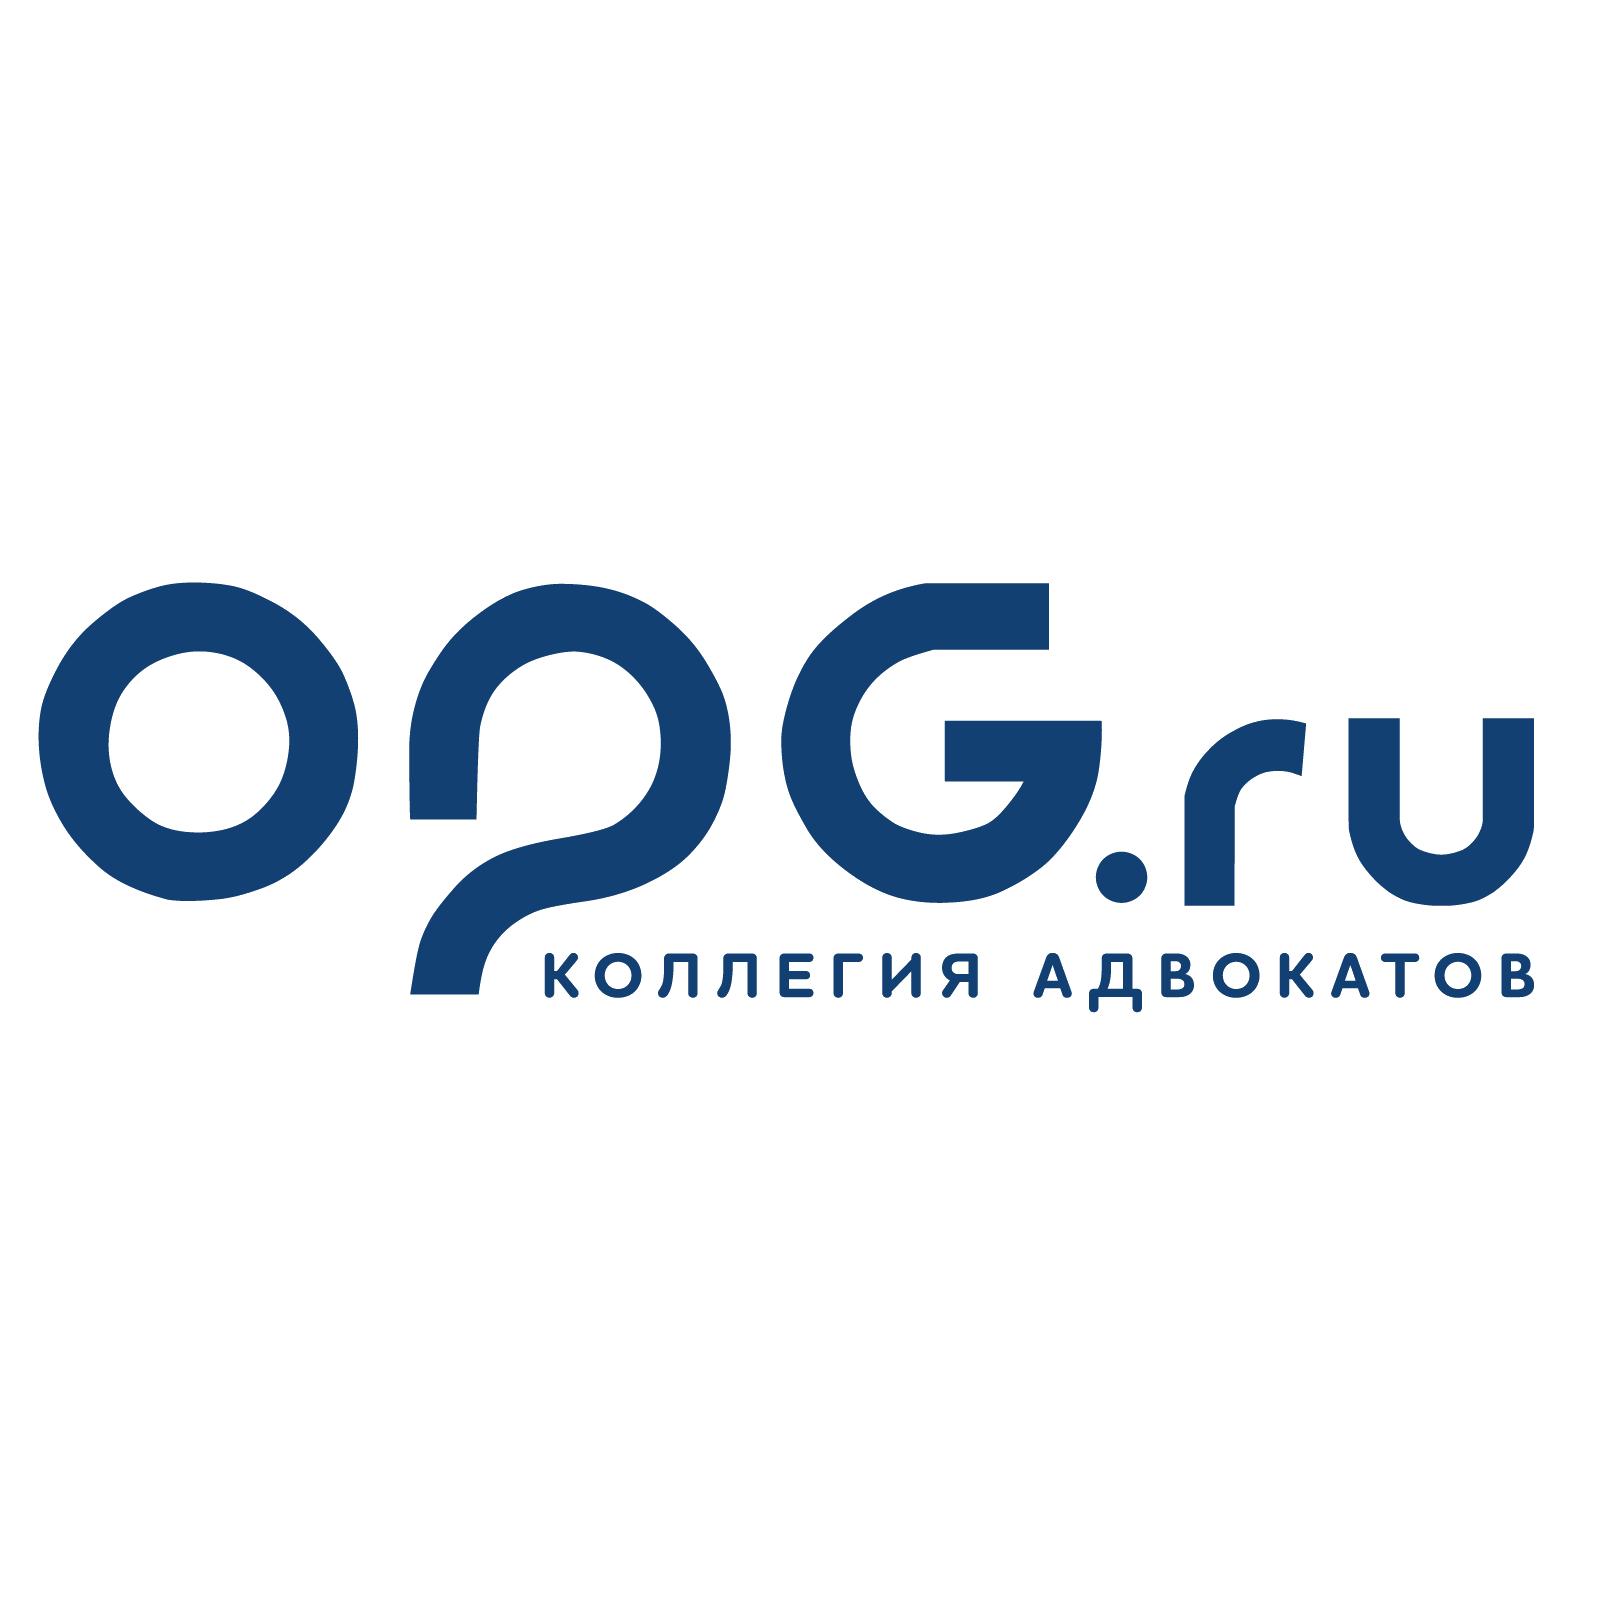 Ребрендинг коллегии адвокатов ОПГ